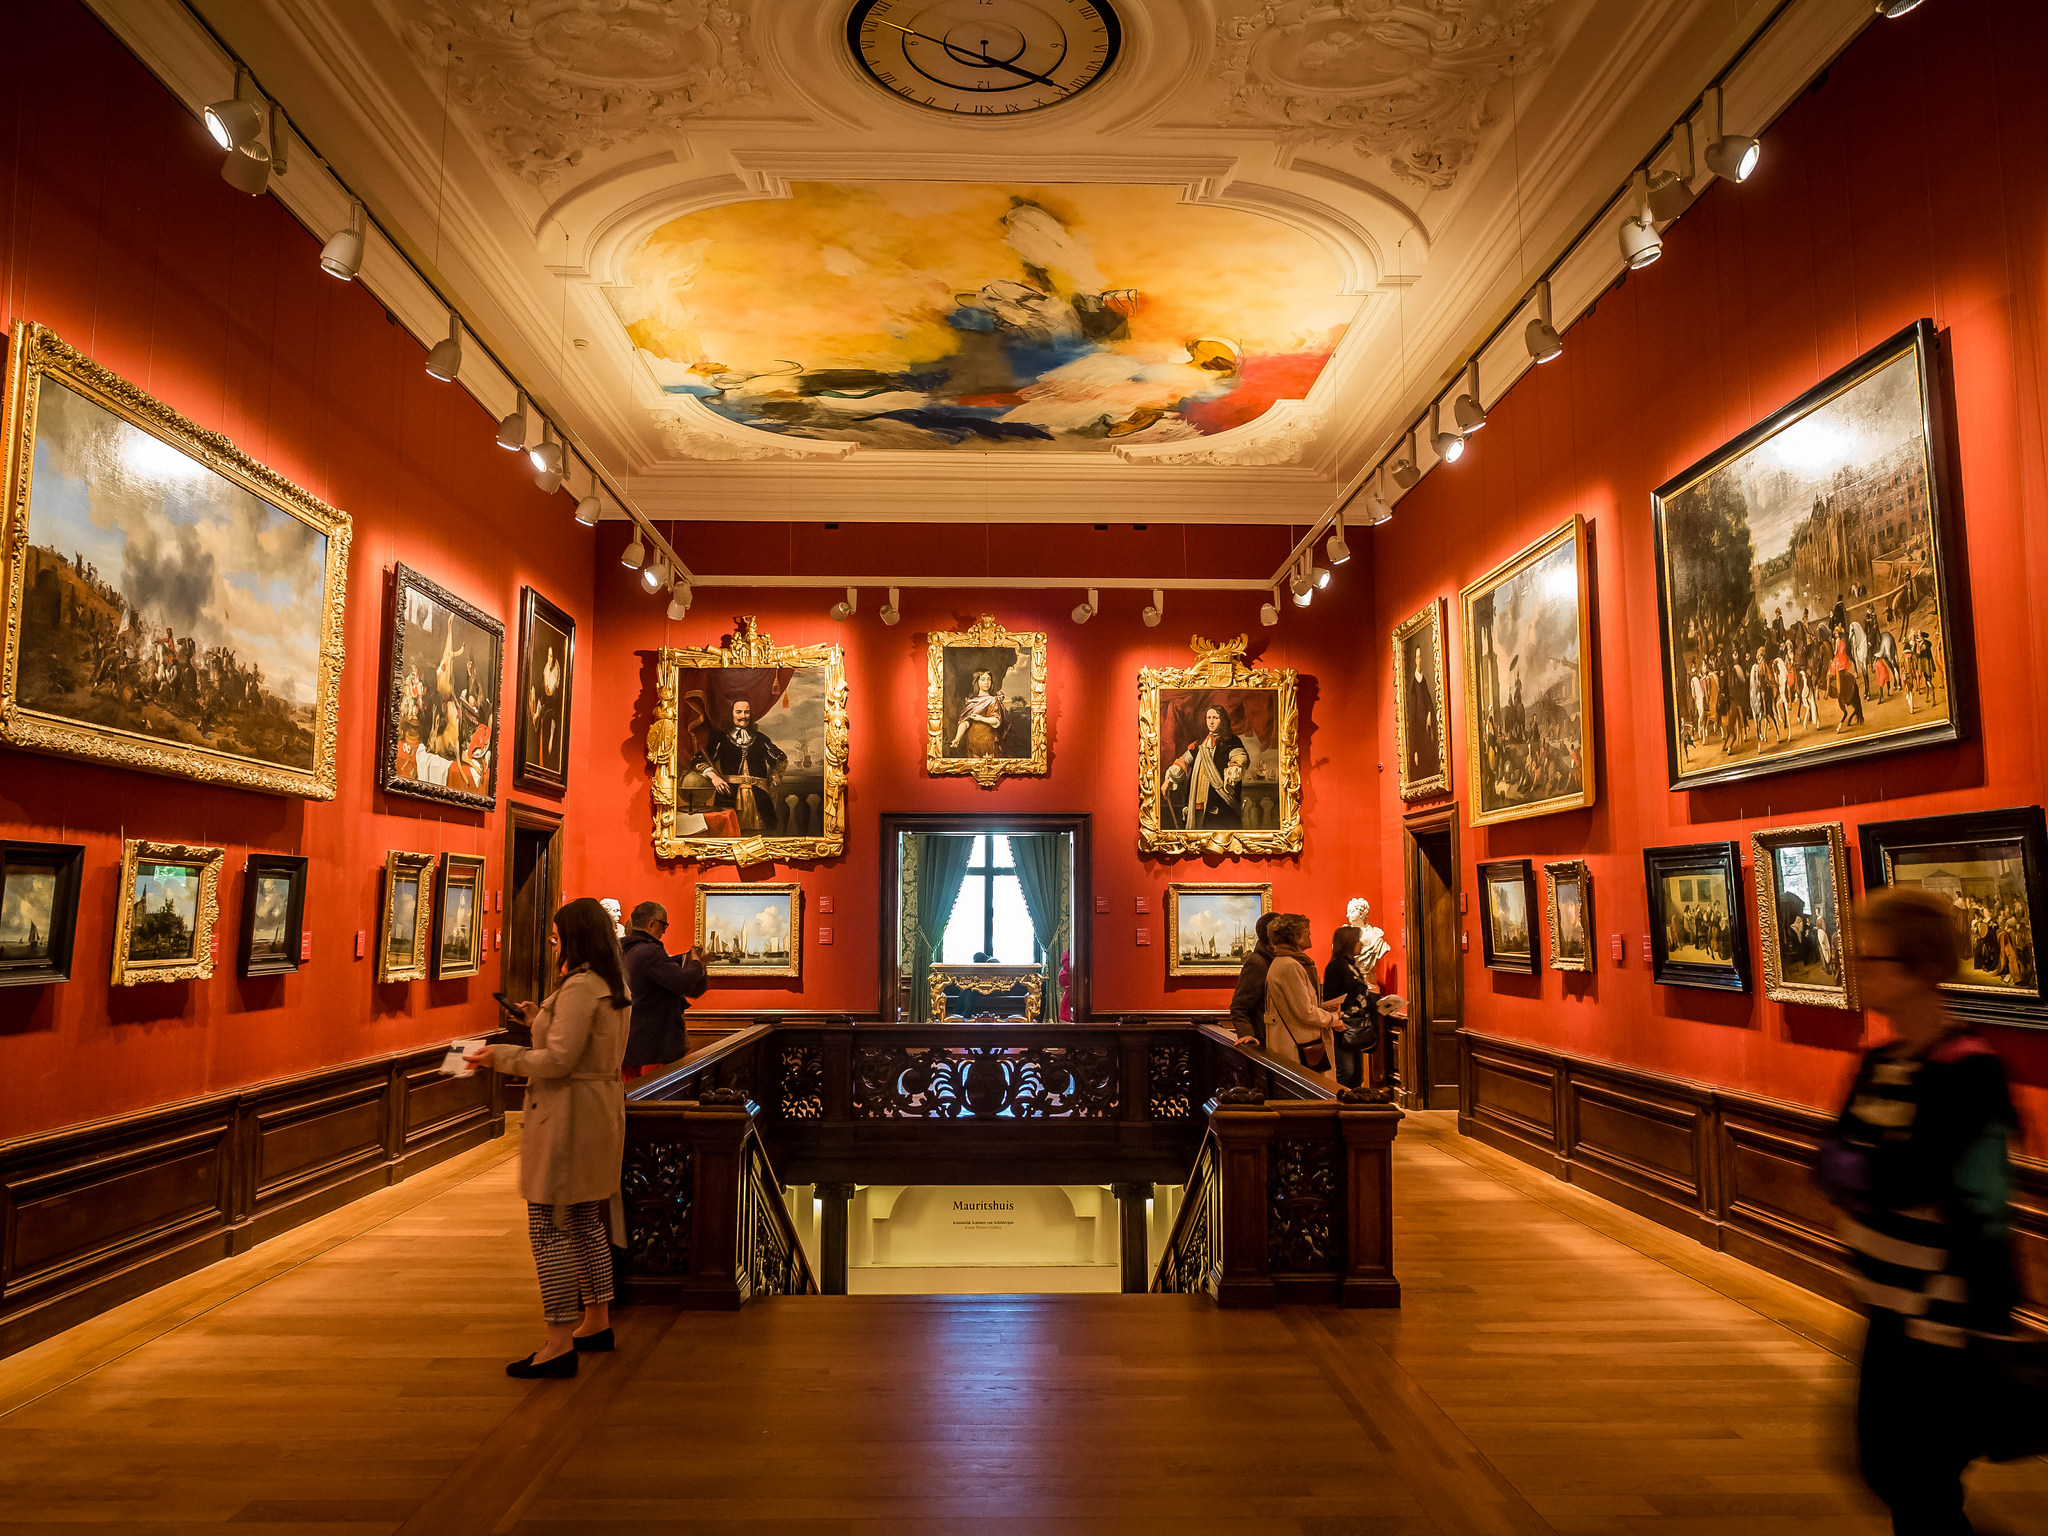 Королевская галерея Маурицхёйс, интерьер